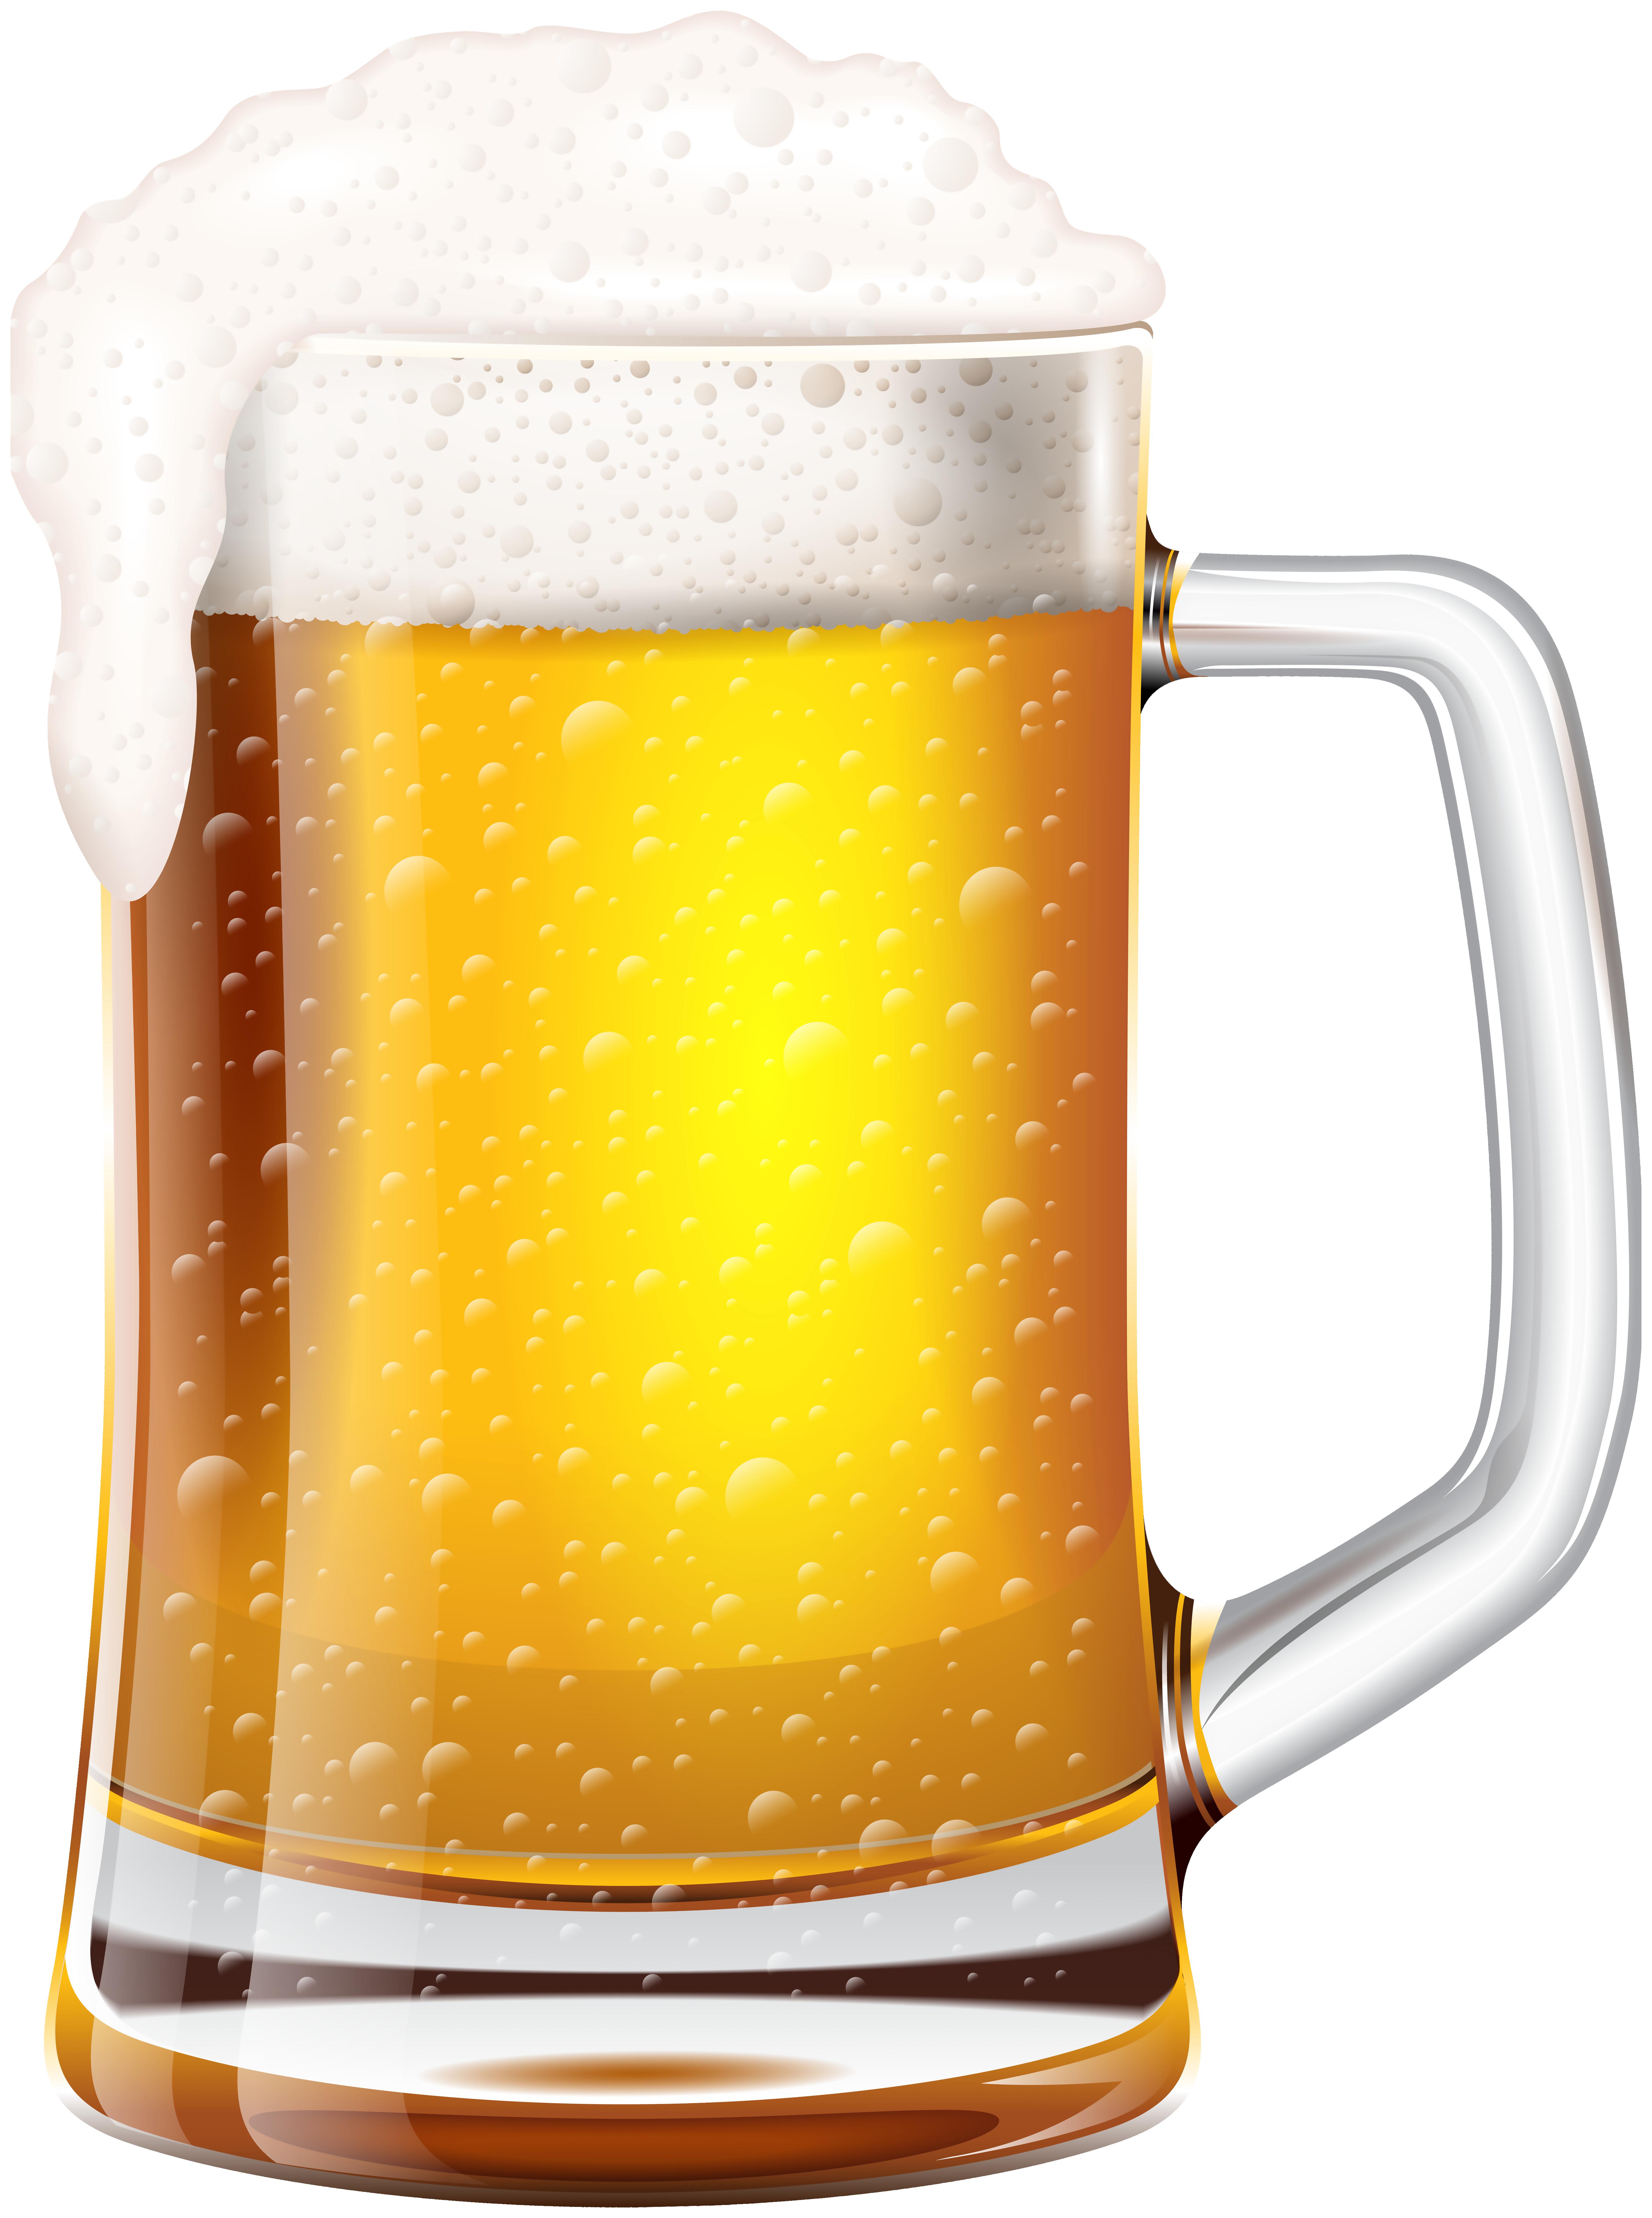 Beer Mug Clip Art Image.